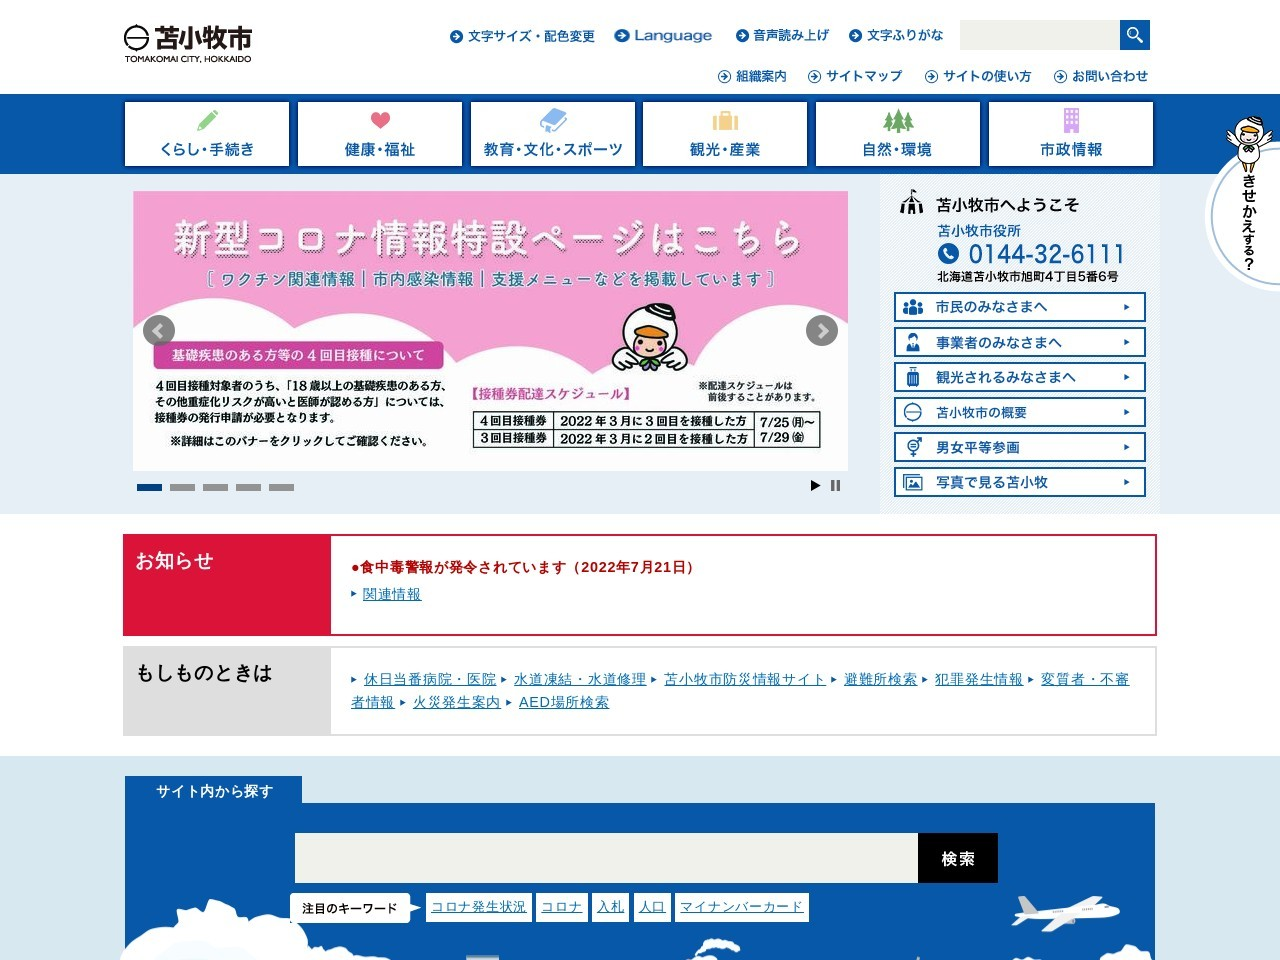 http://www.city.tomakomai.hokkaido.jp/kurashi/mynumber/h30campaign.html